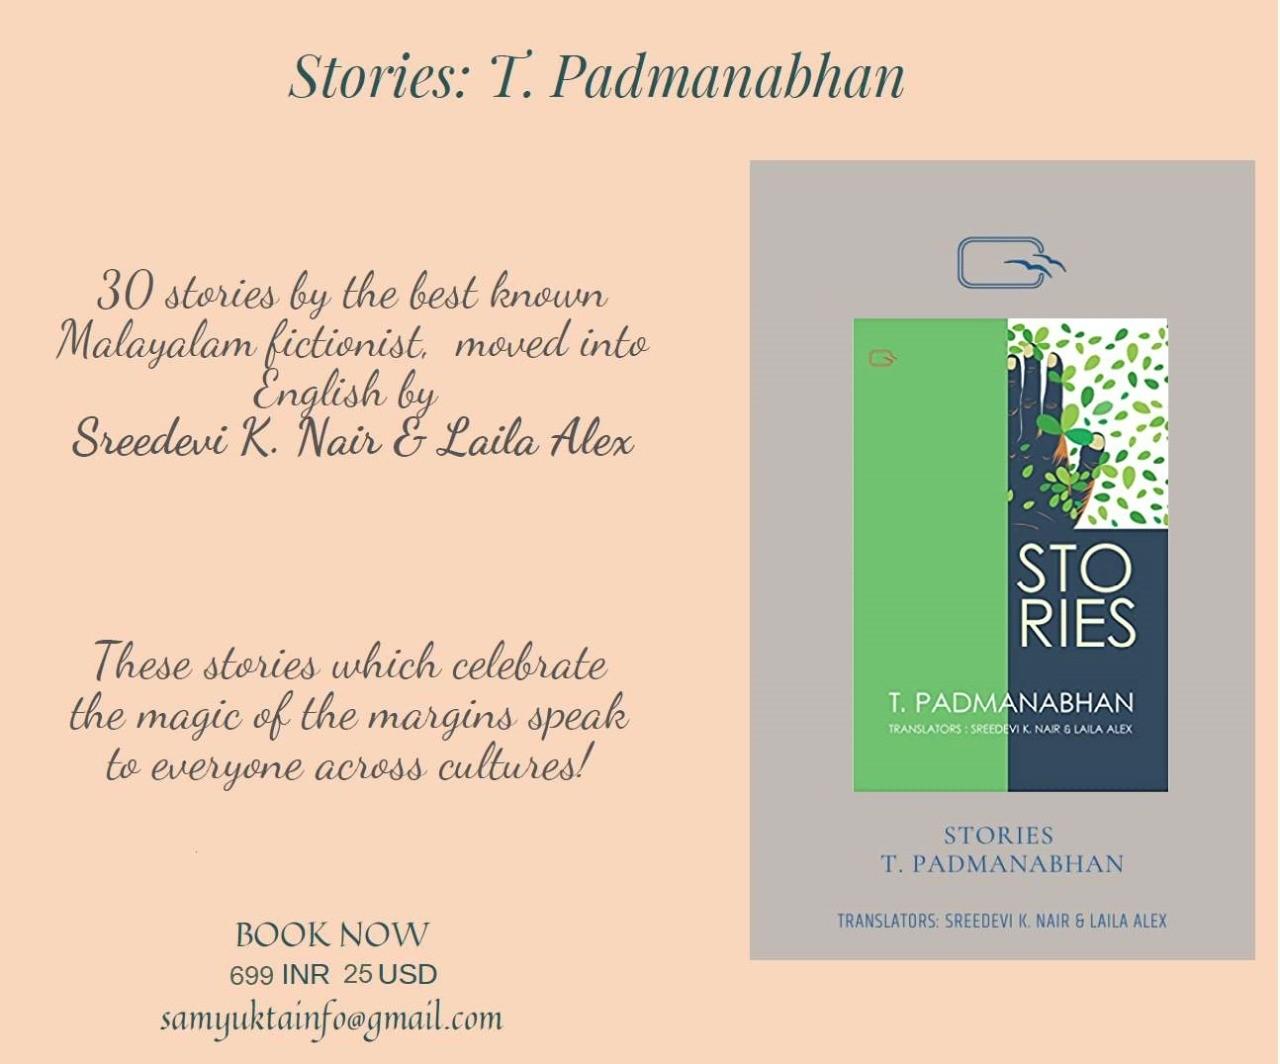 Stories - T Padmanabhan